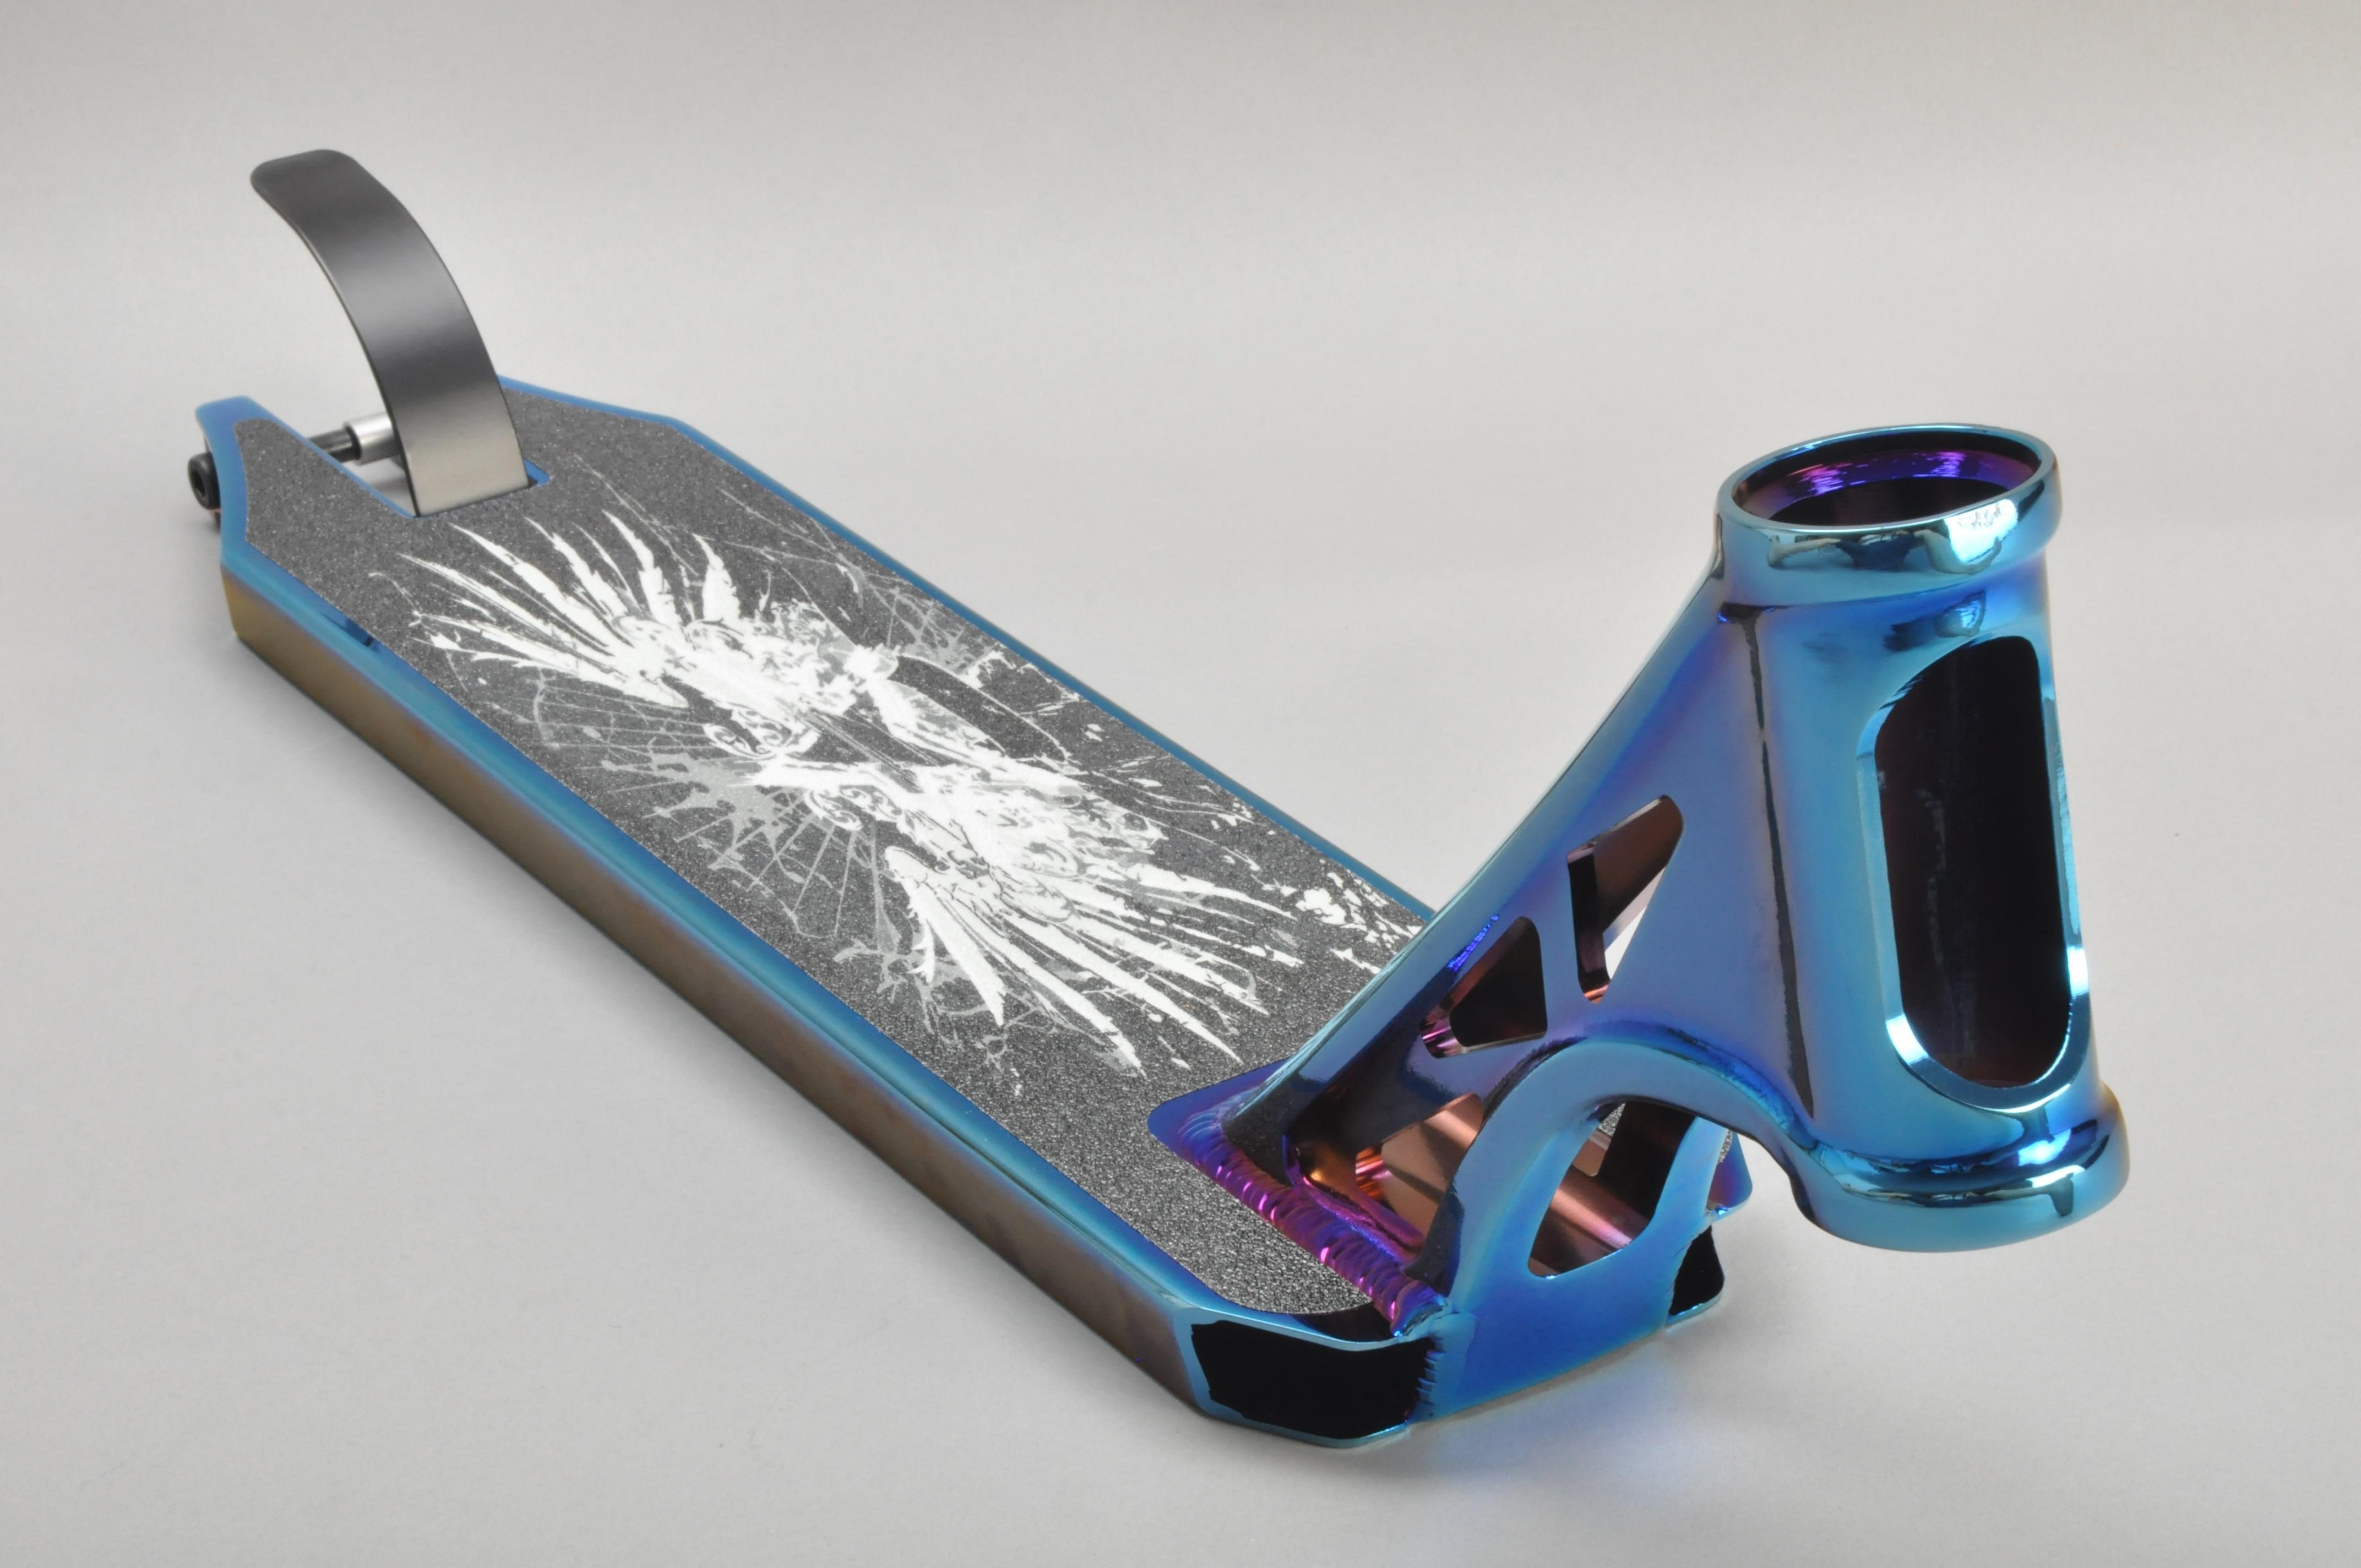 Funsea producent porcelany 115*500mm stopu aluminium 6061 części skuter PVD niebieski hulajnoga pokłady hulajnoga deck